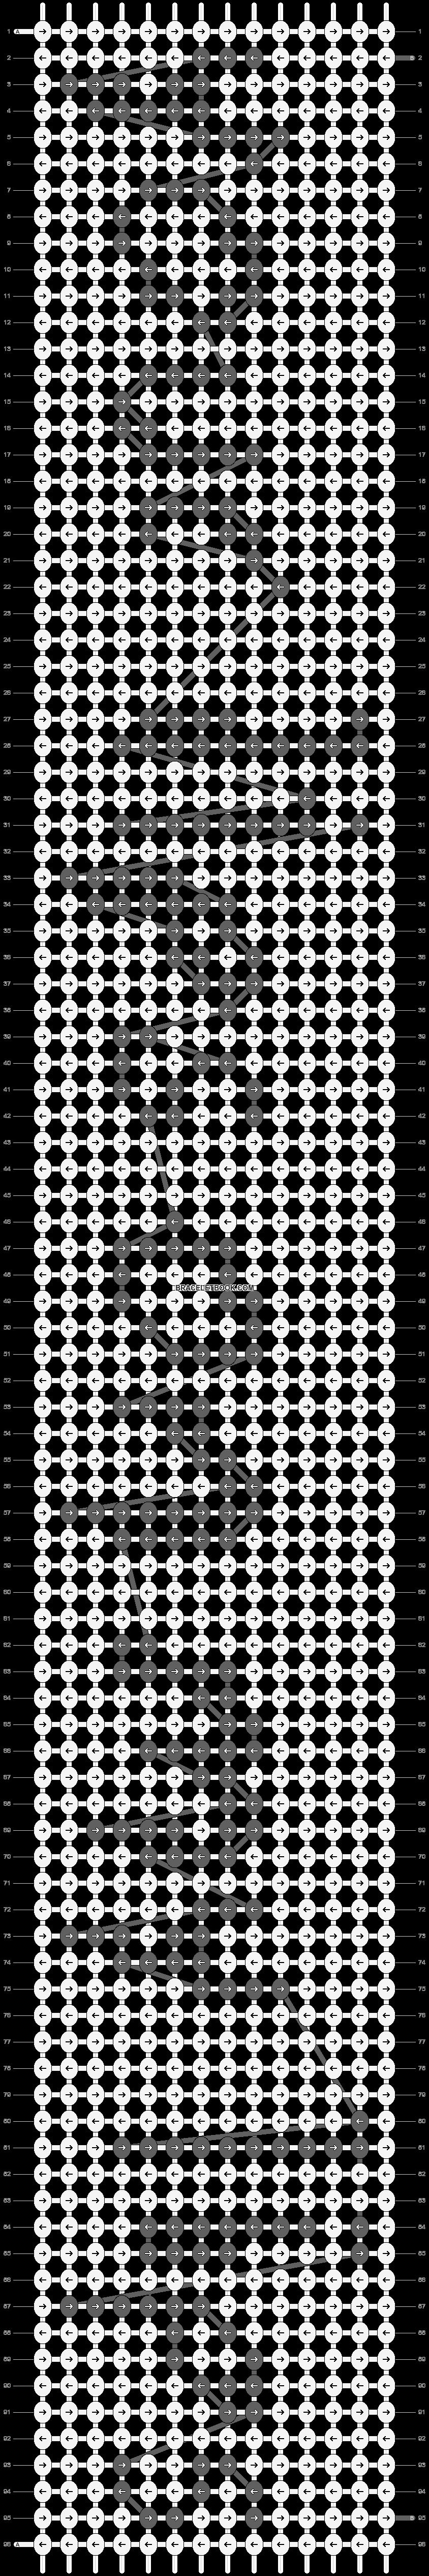 Alpha pattern #4626 pattern